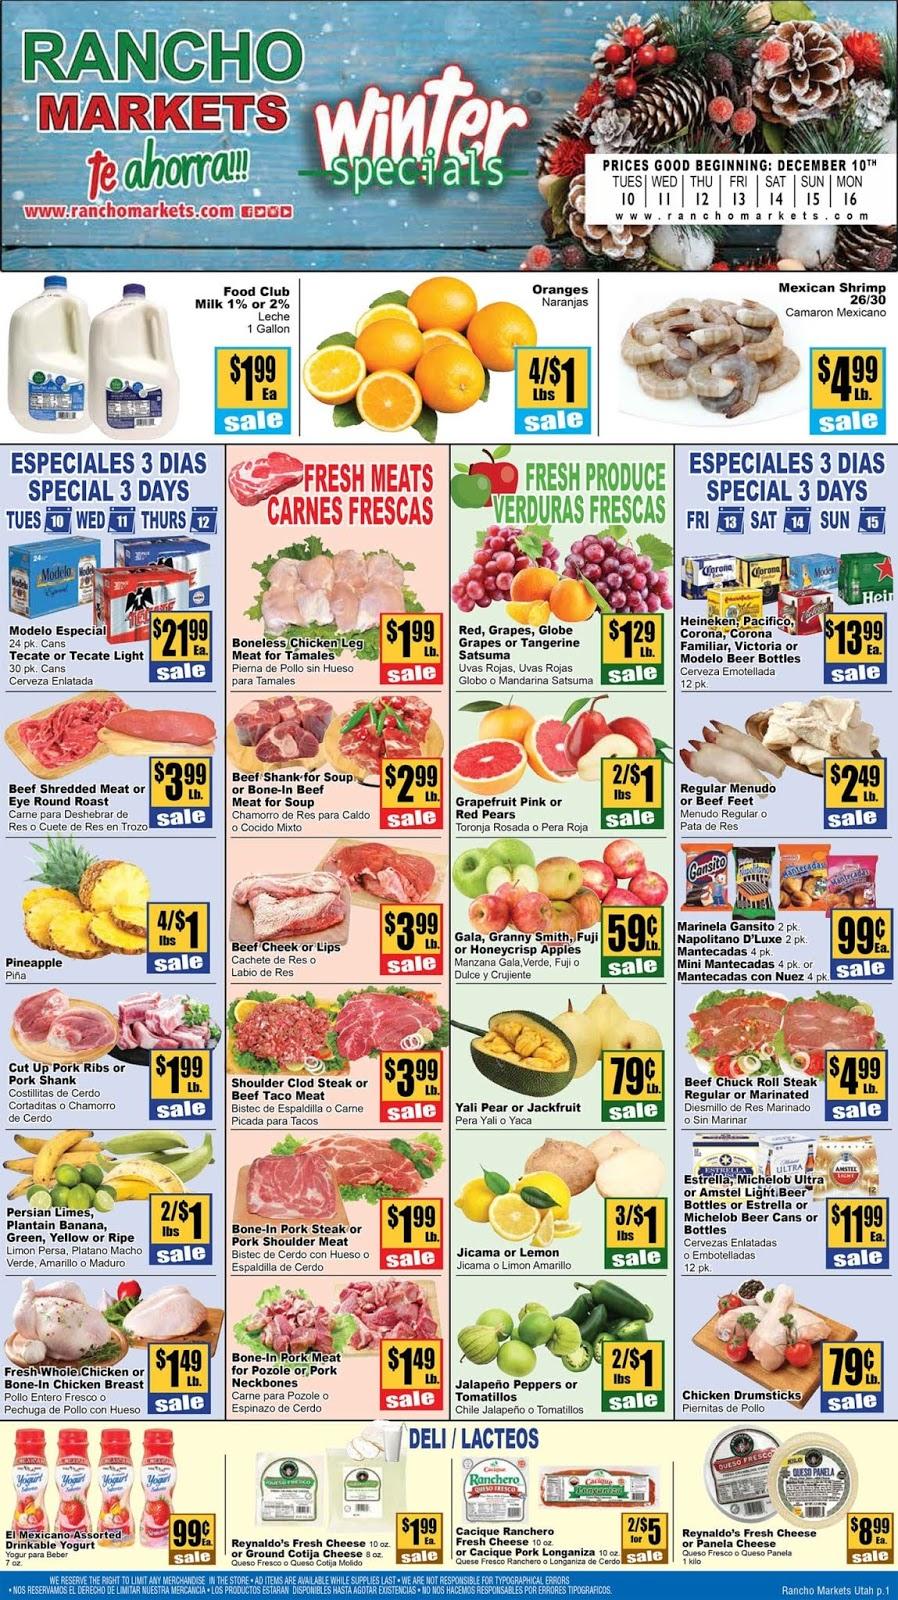 Rancho Markets Weekly Ad